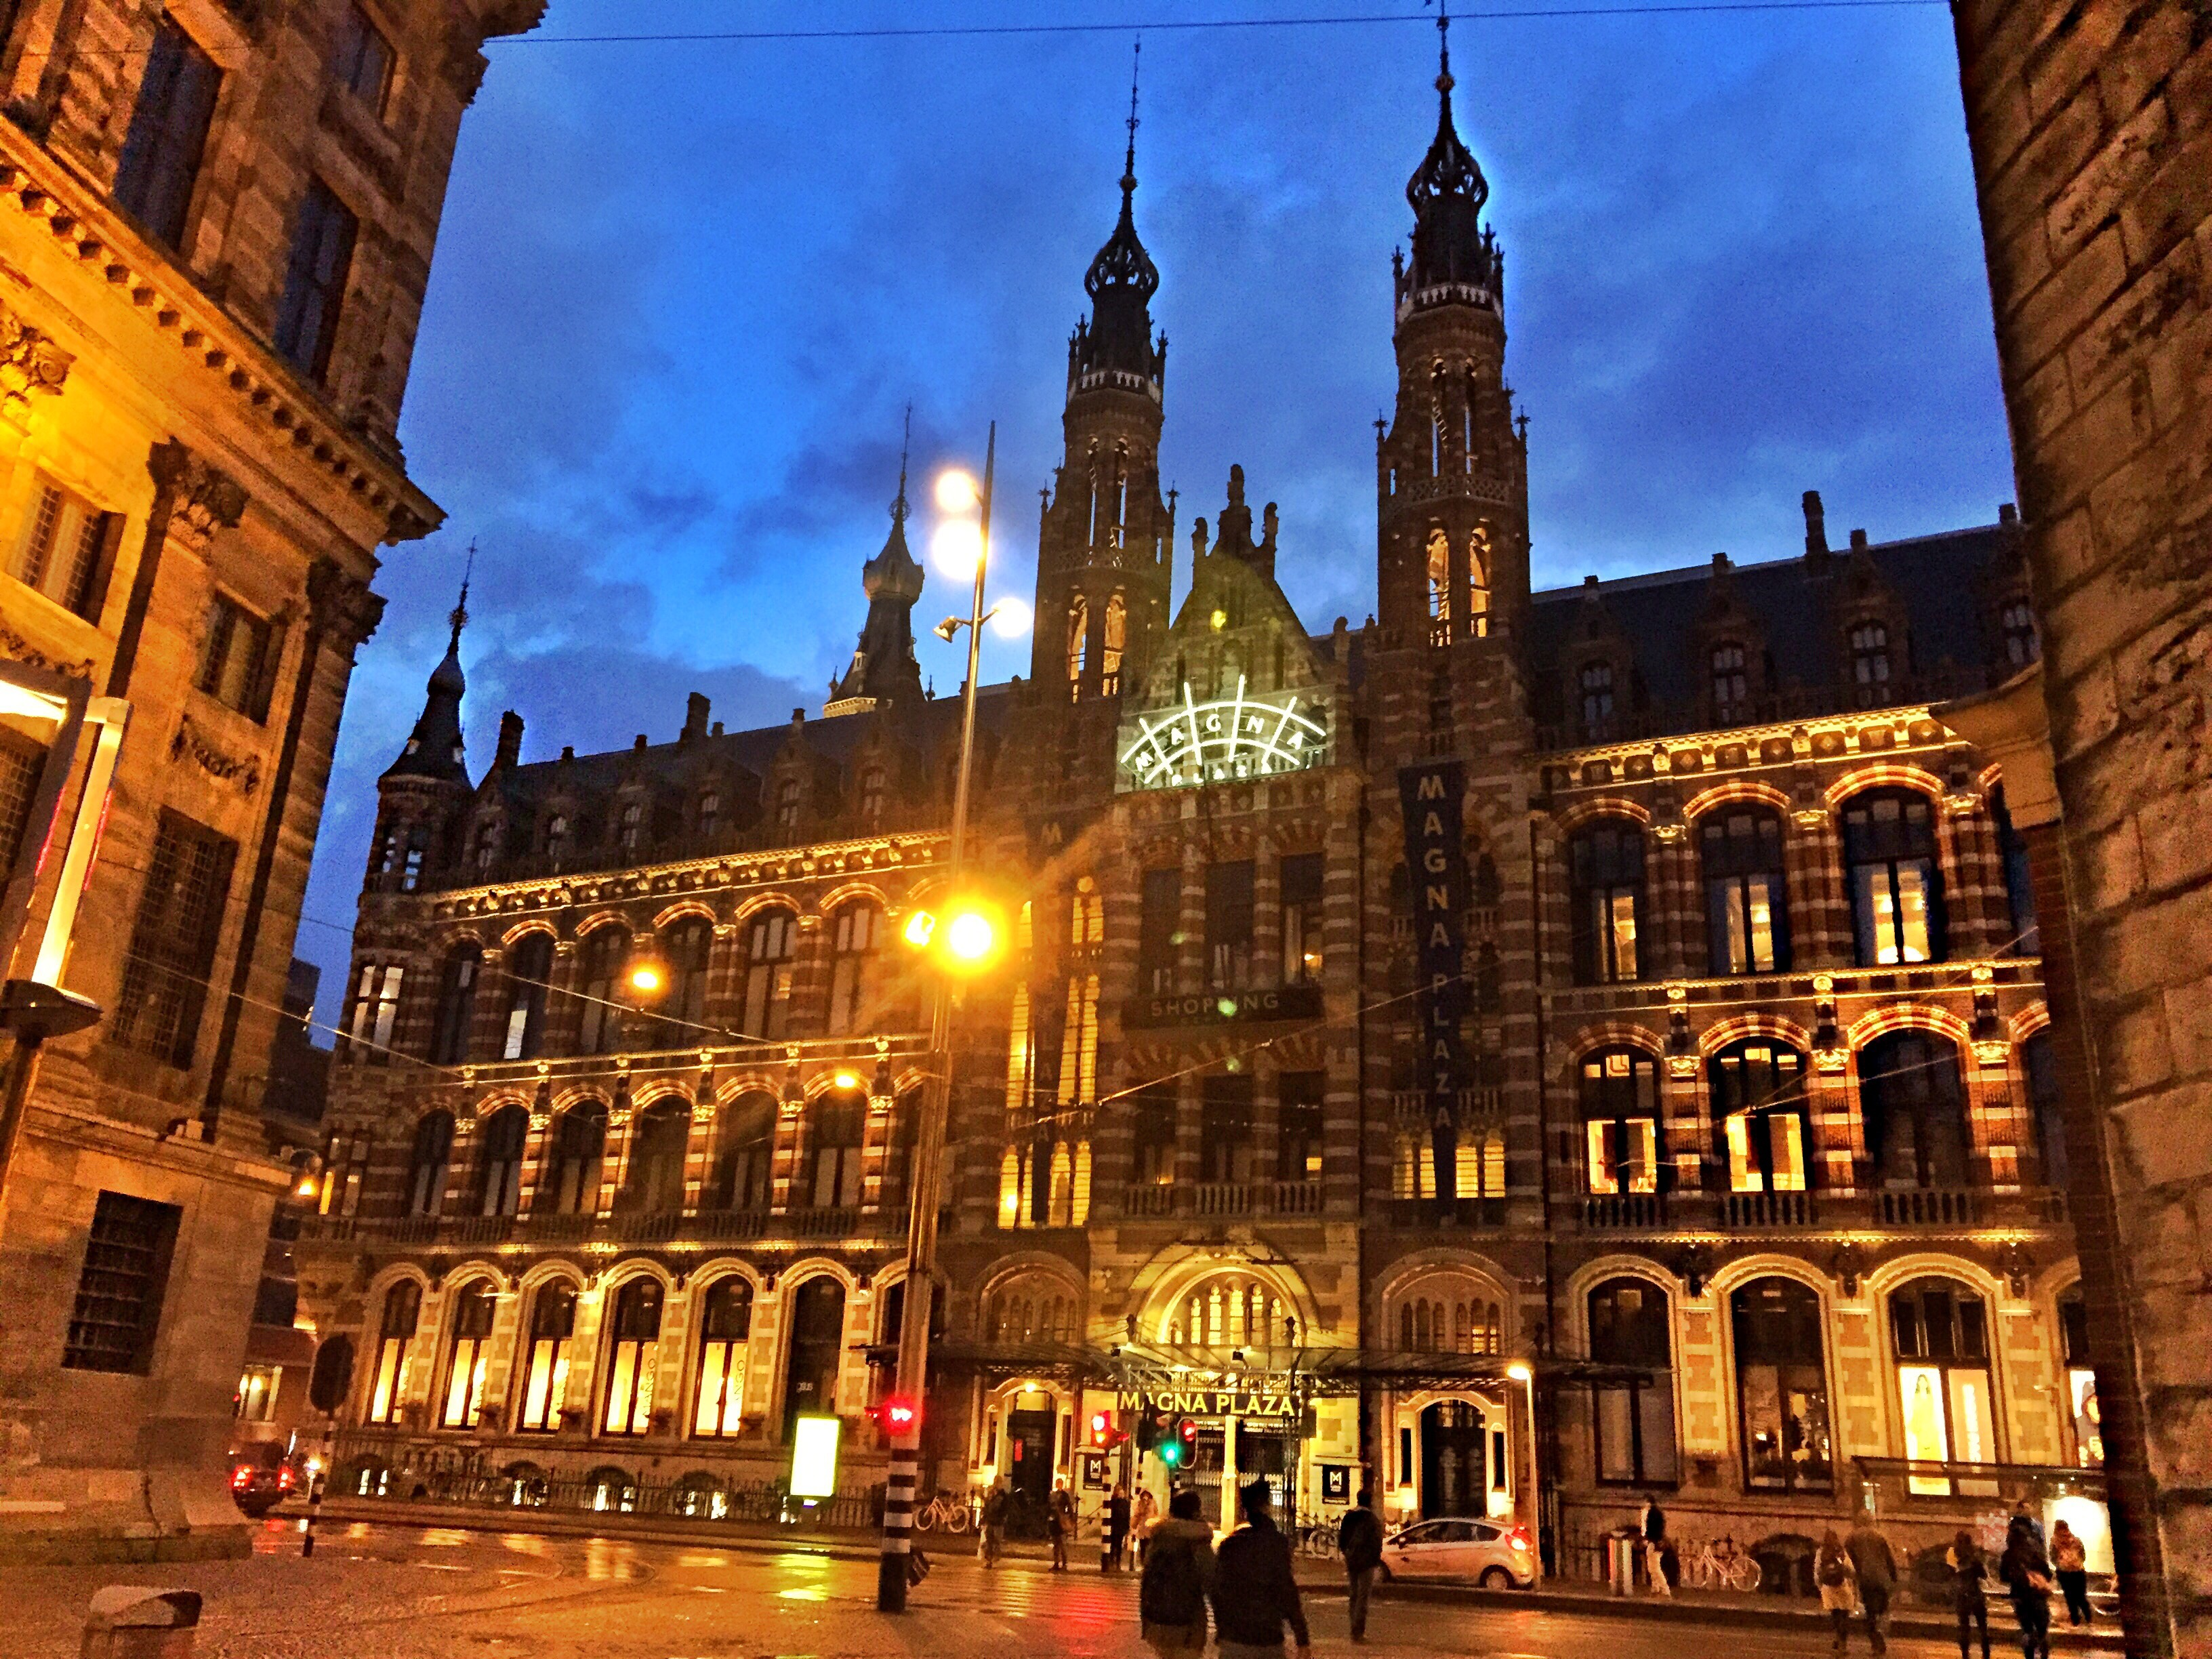 Amsterdam - Nieuwe Zijde - Magna Plaza